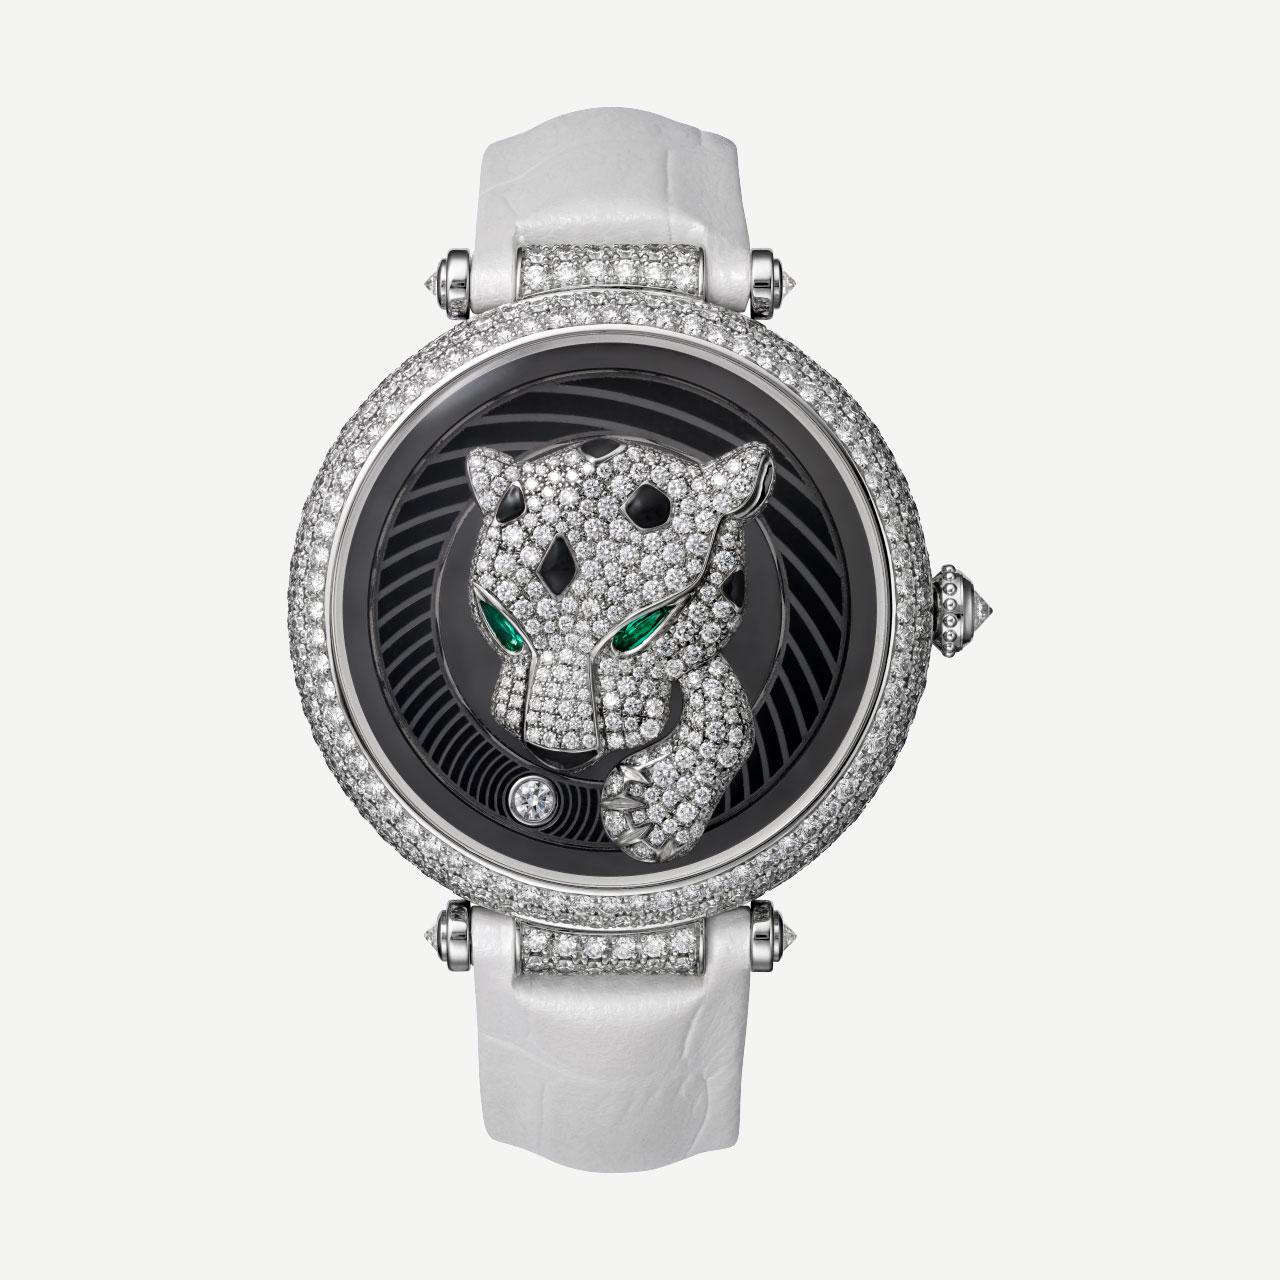 Cartier Panthère Joueuse watch